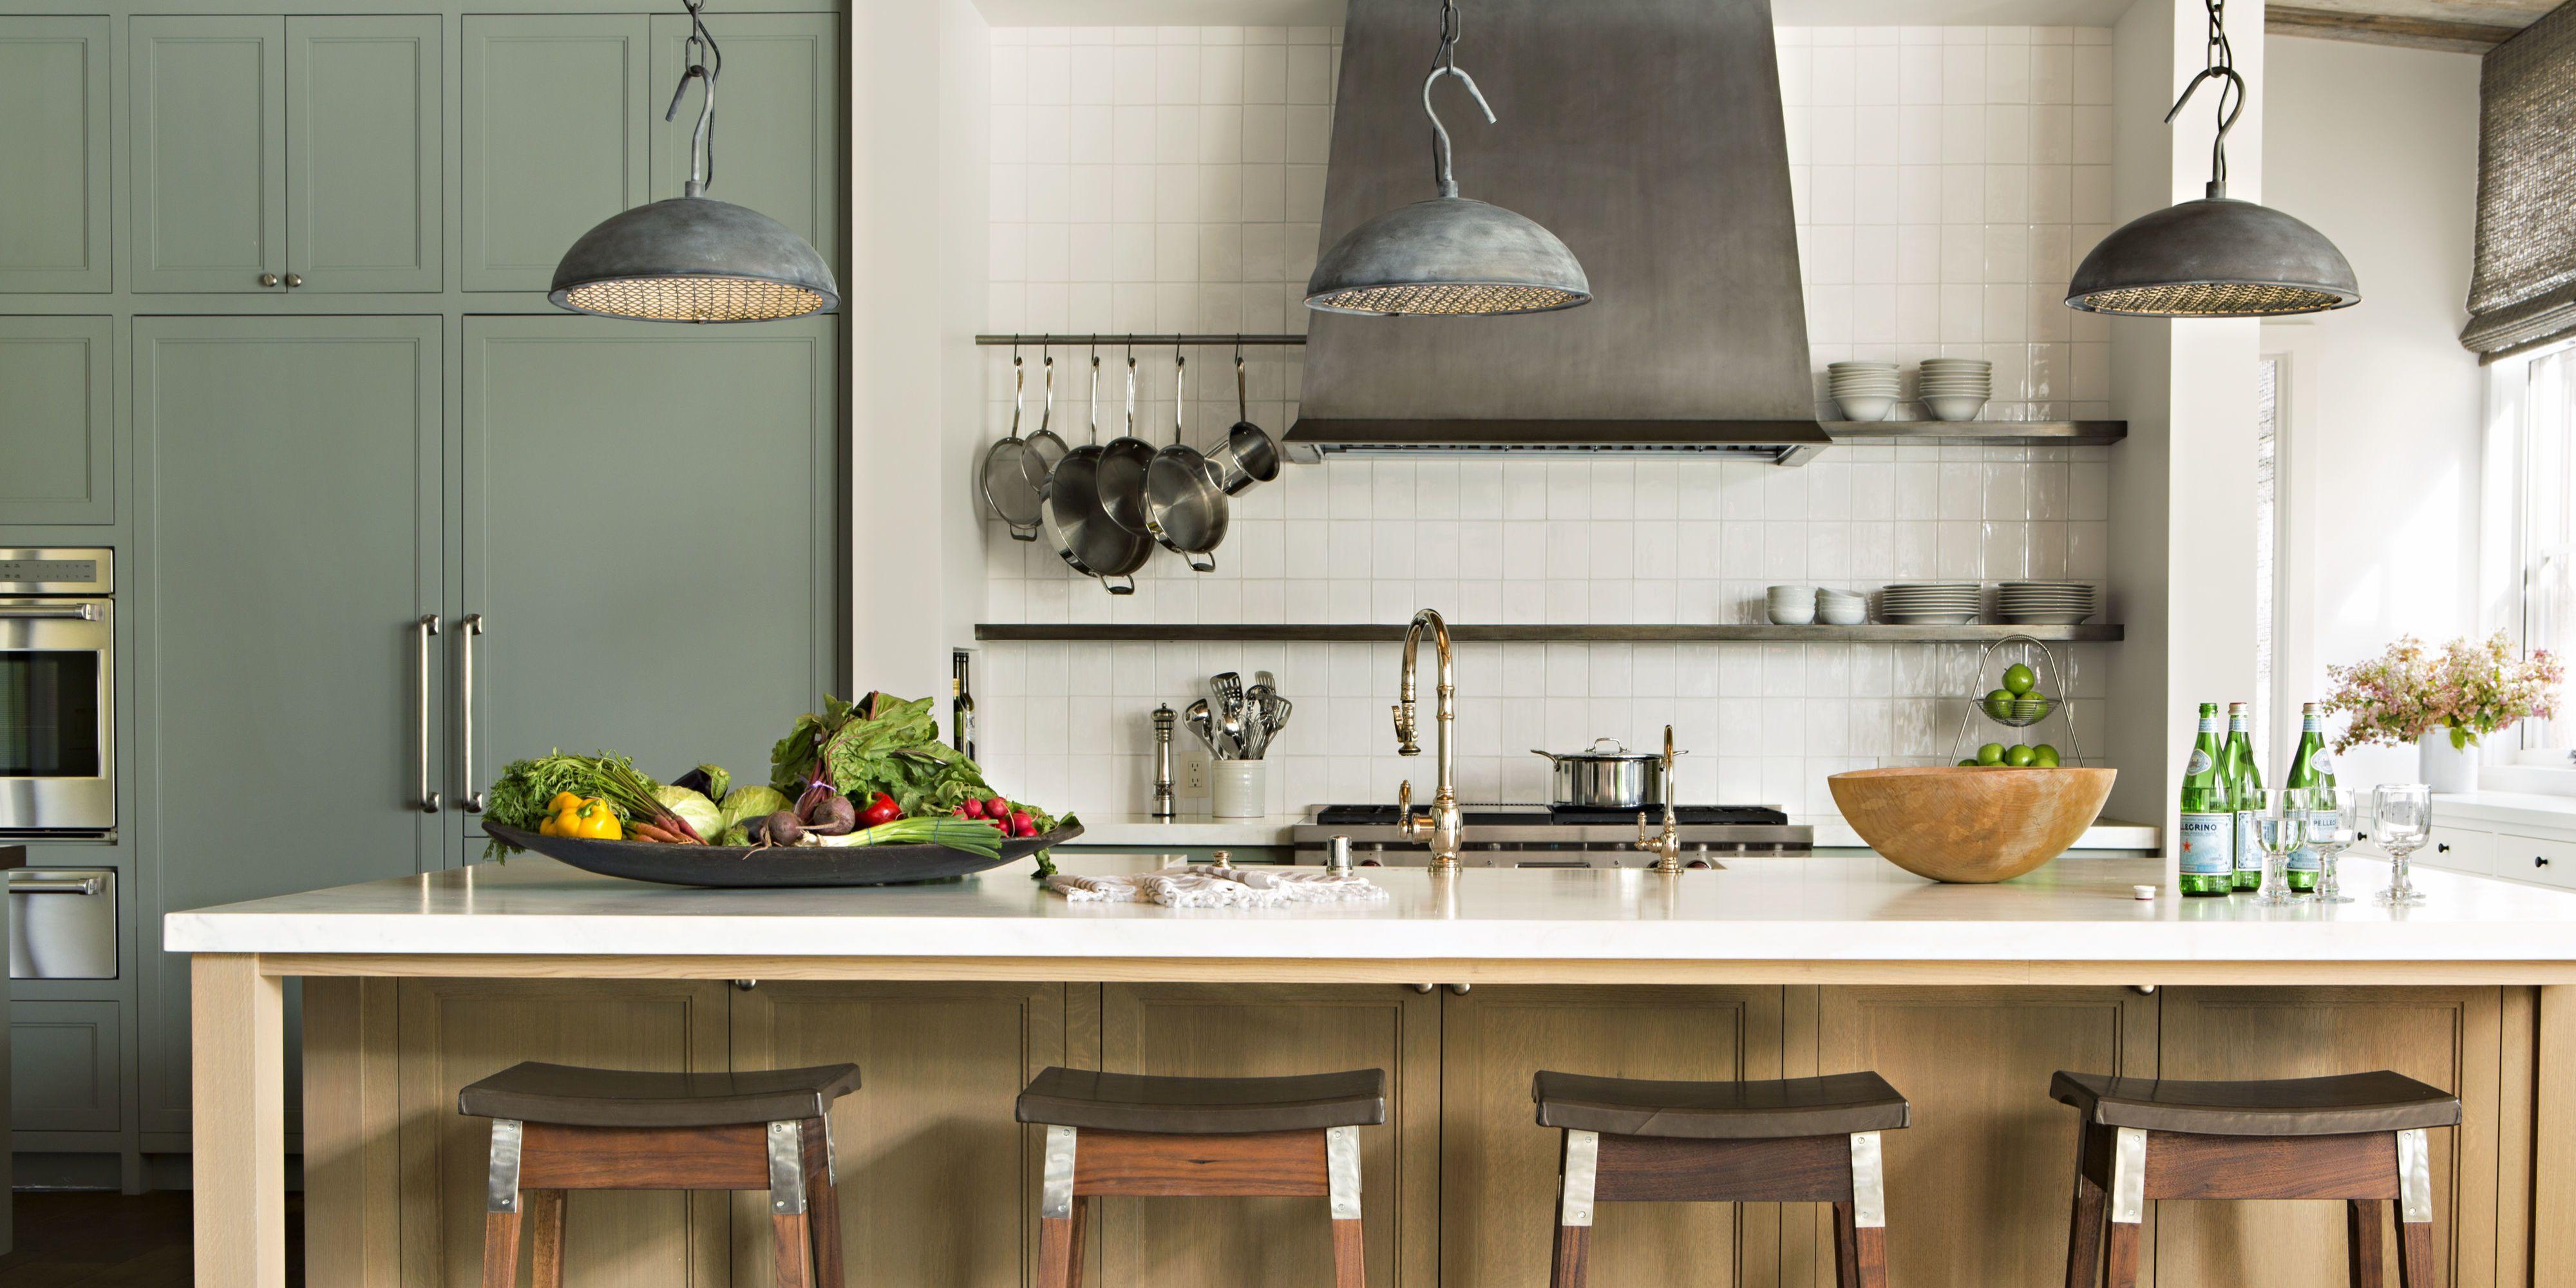 20 best kitchen lighting ideas modern light fixtures for home rh housebeautiful com lighting fixtures for kitchen table lighting fixtures for kitchen table